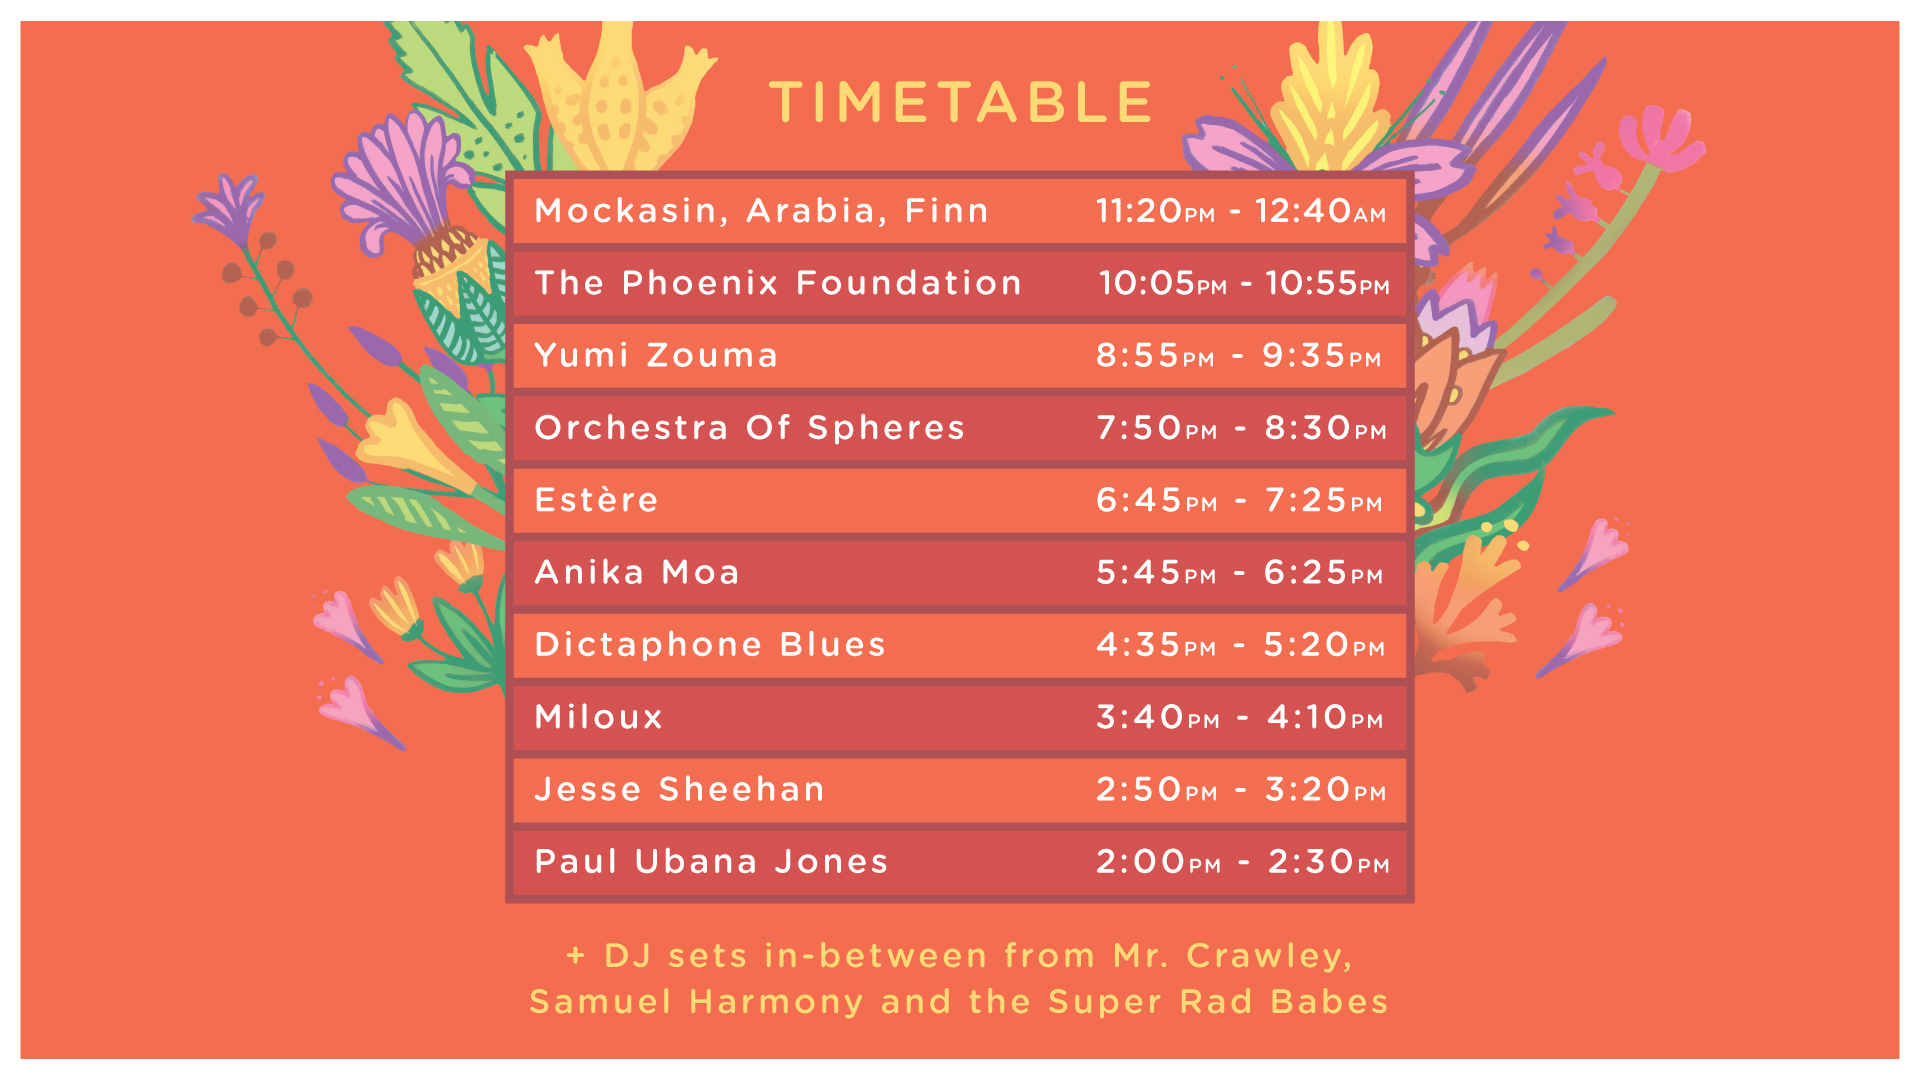 Wondergarden Timetable_FB_Sep 19.jpg